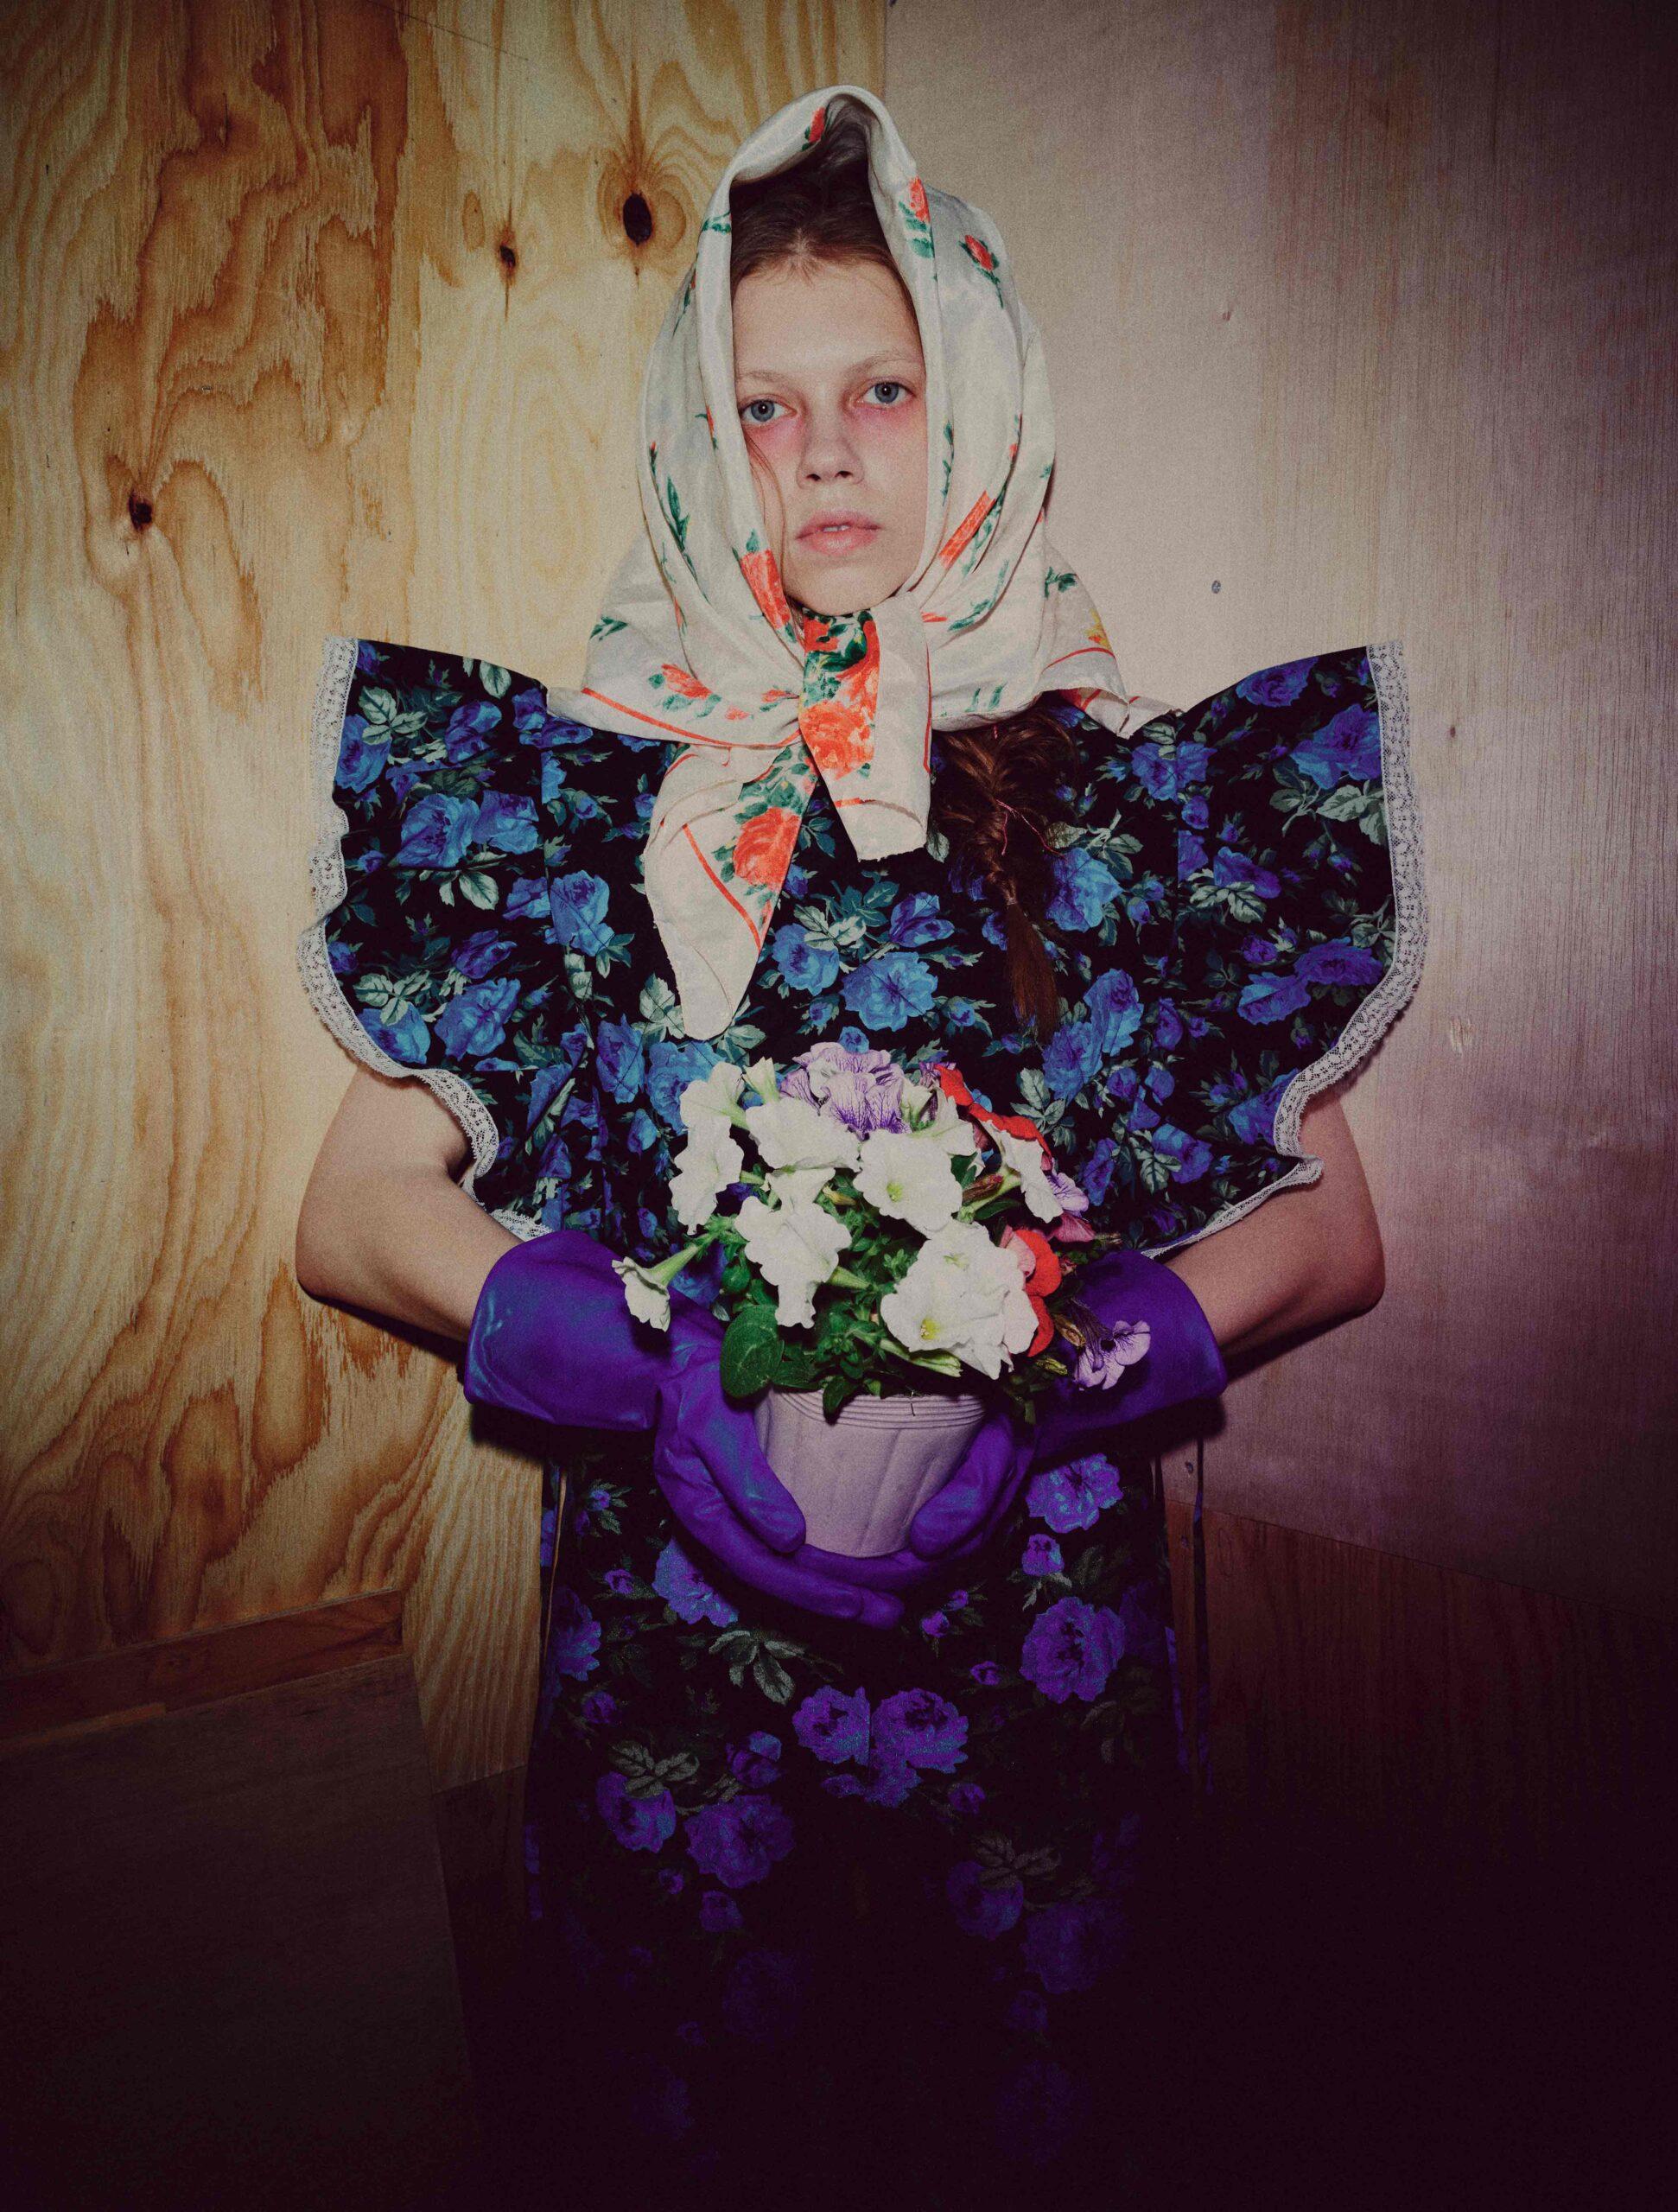 Melampo-Hausaufgaben-Collection-flower-wing-quilted-bib